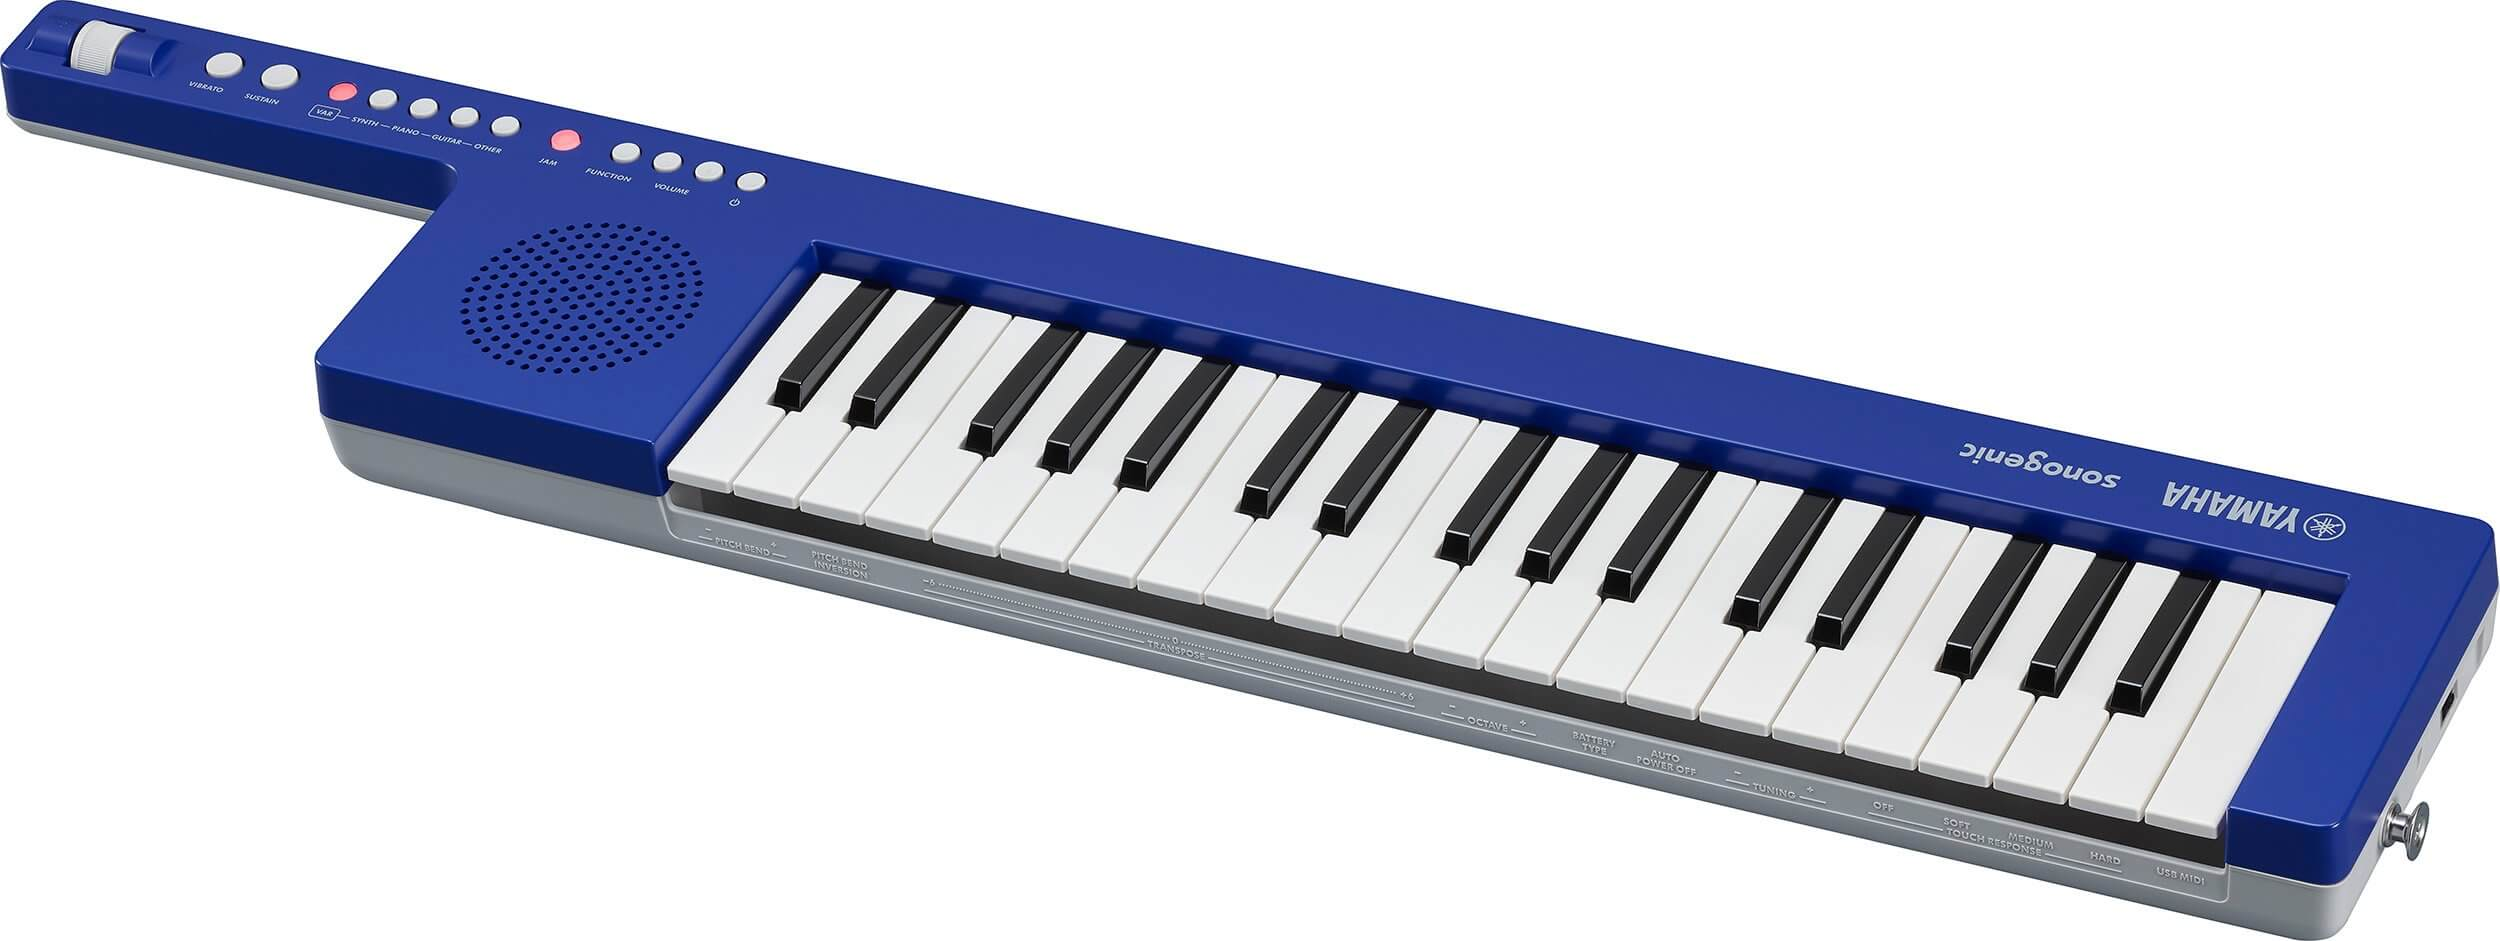 Sonogenic Yamaha SHS-300